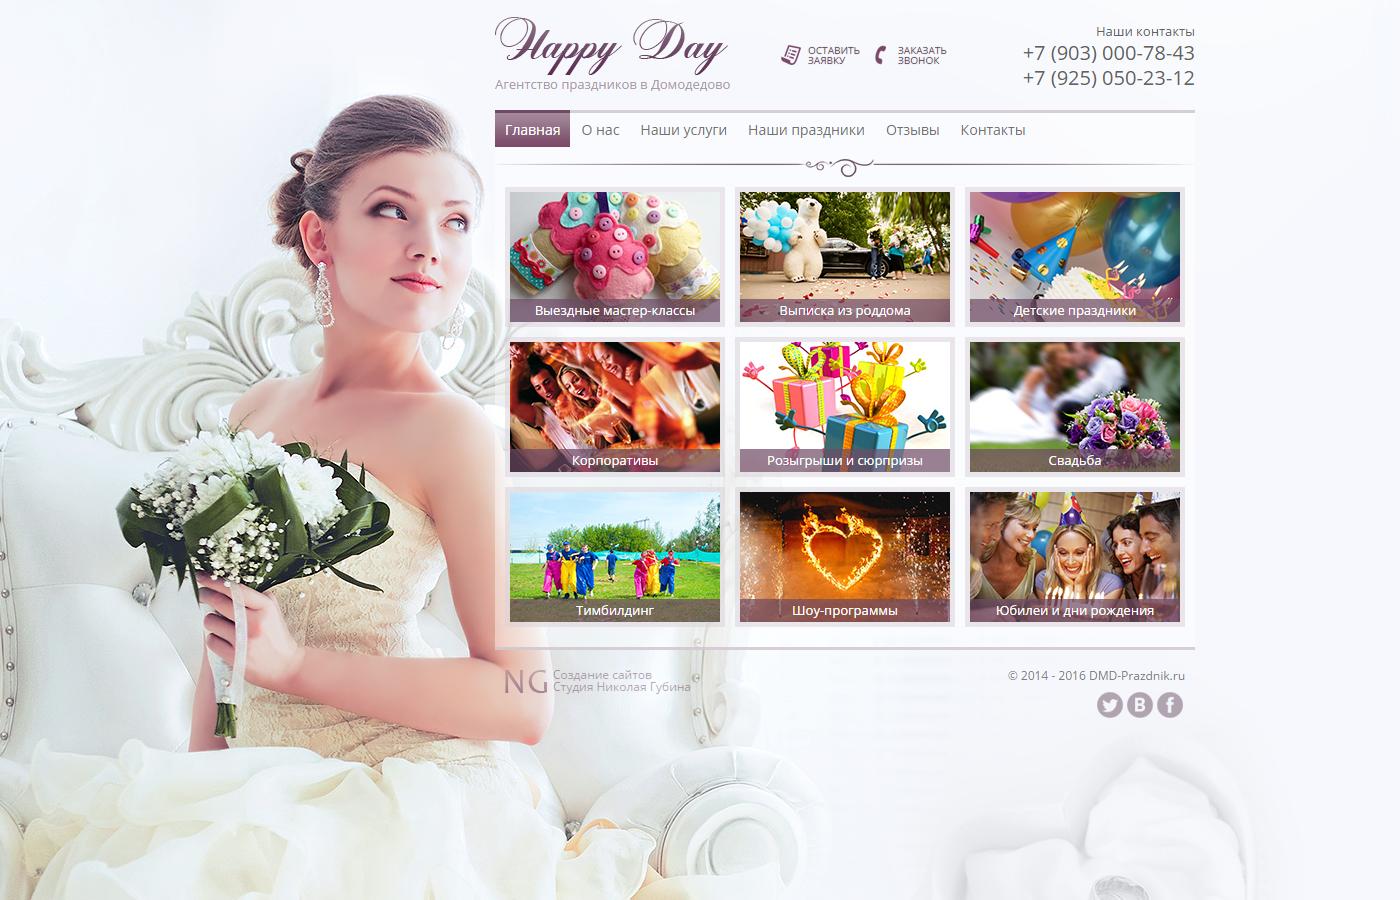 2015 - Сайт организатора праздников